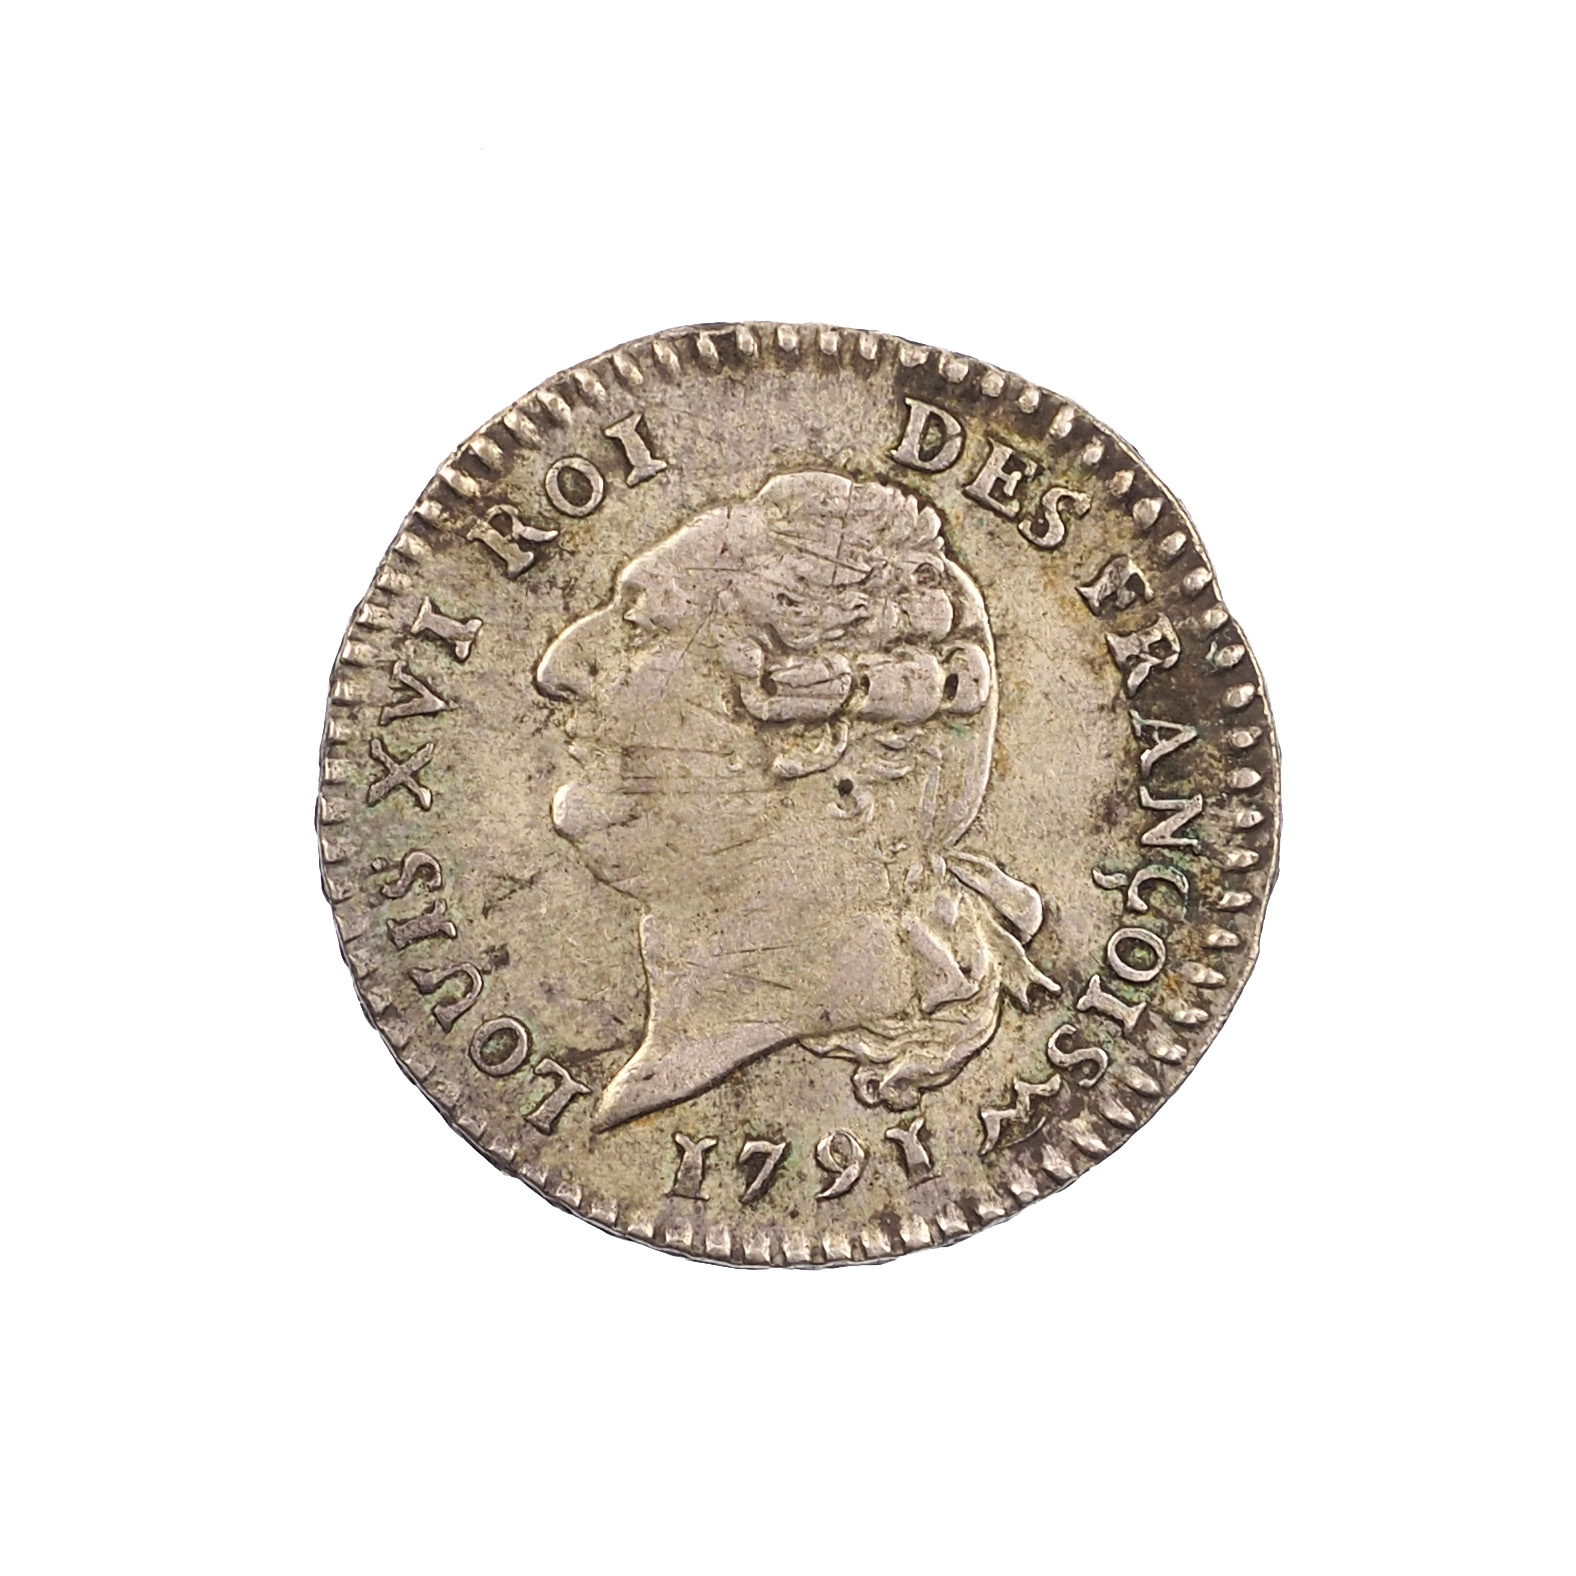 Louis XVI, 15 Sols 1791 An 3 N, Montpellier, TTB+, Gad.36, RARISSIME différent !